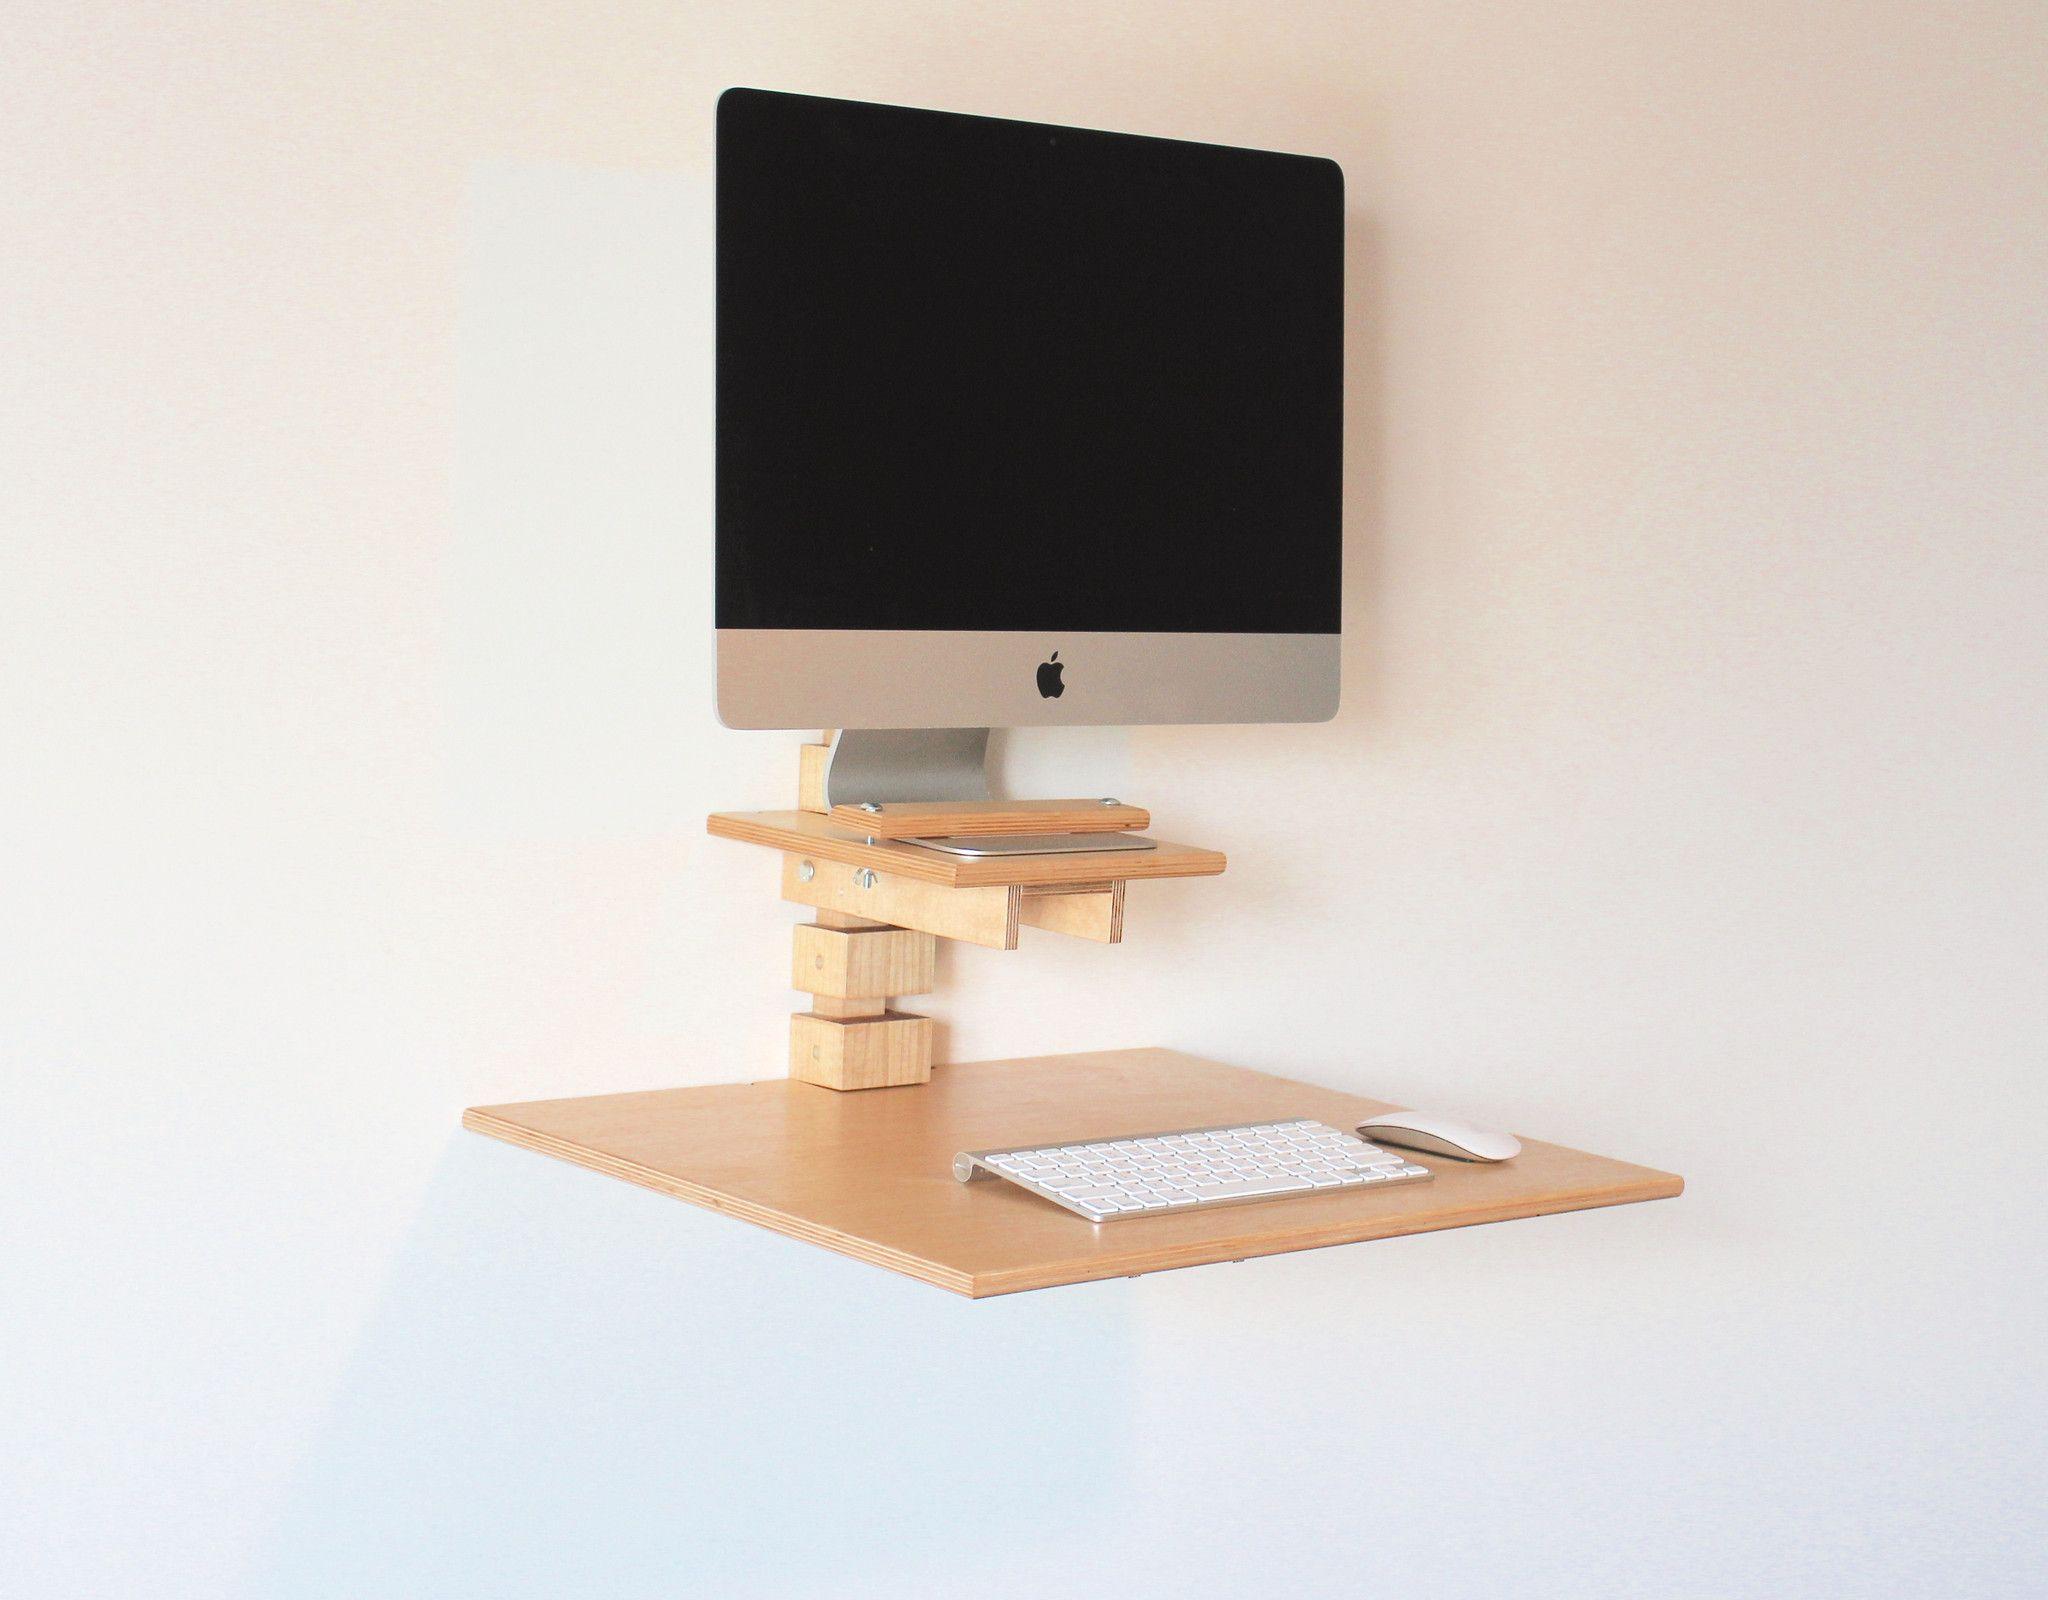 wall mounted standing desk imac model startup office pinterest rh pinterest com wall mounted standing desk ikea wall mount standing desk